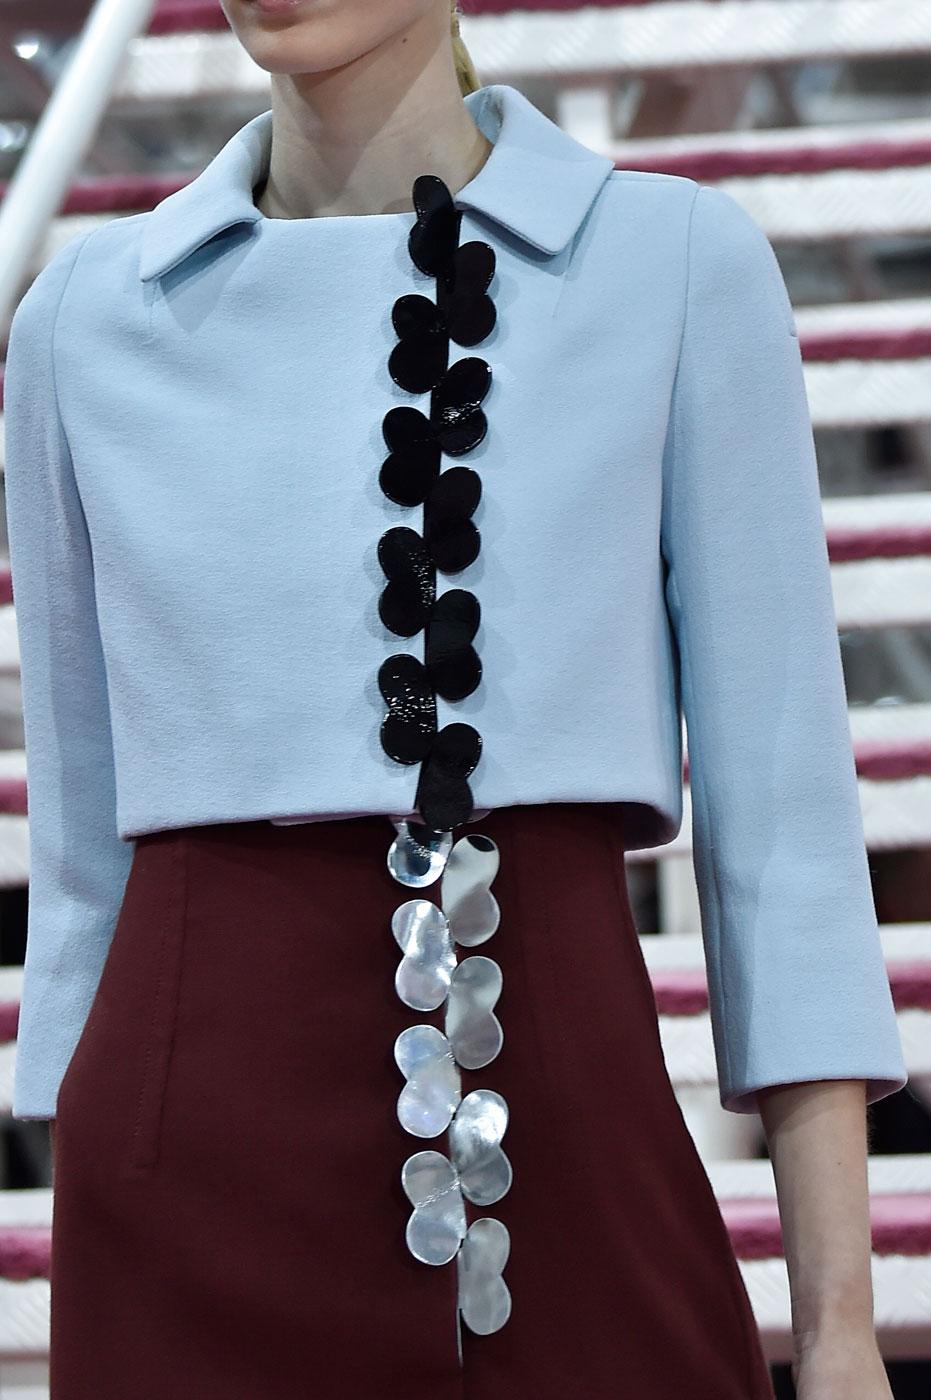 Christian-Dior-fashion-runway-show-close-ups-haute-couture-paris-spring-summer-2015-the-impression-018